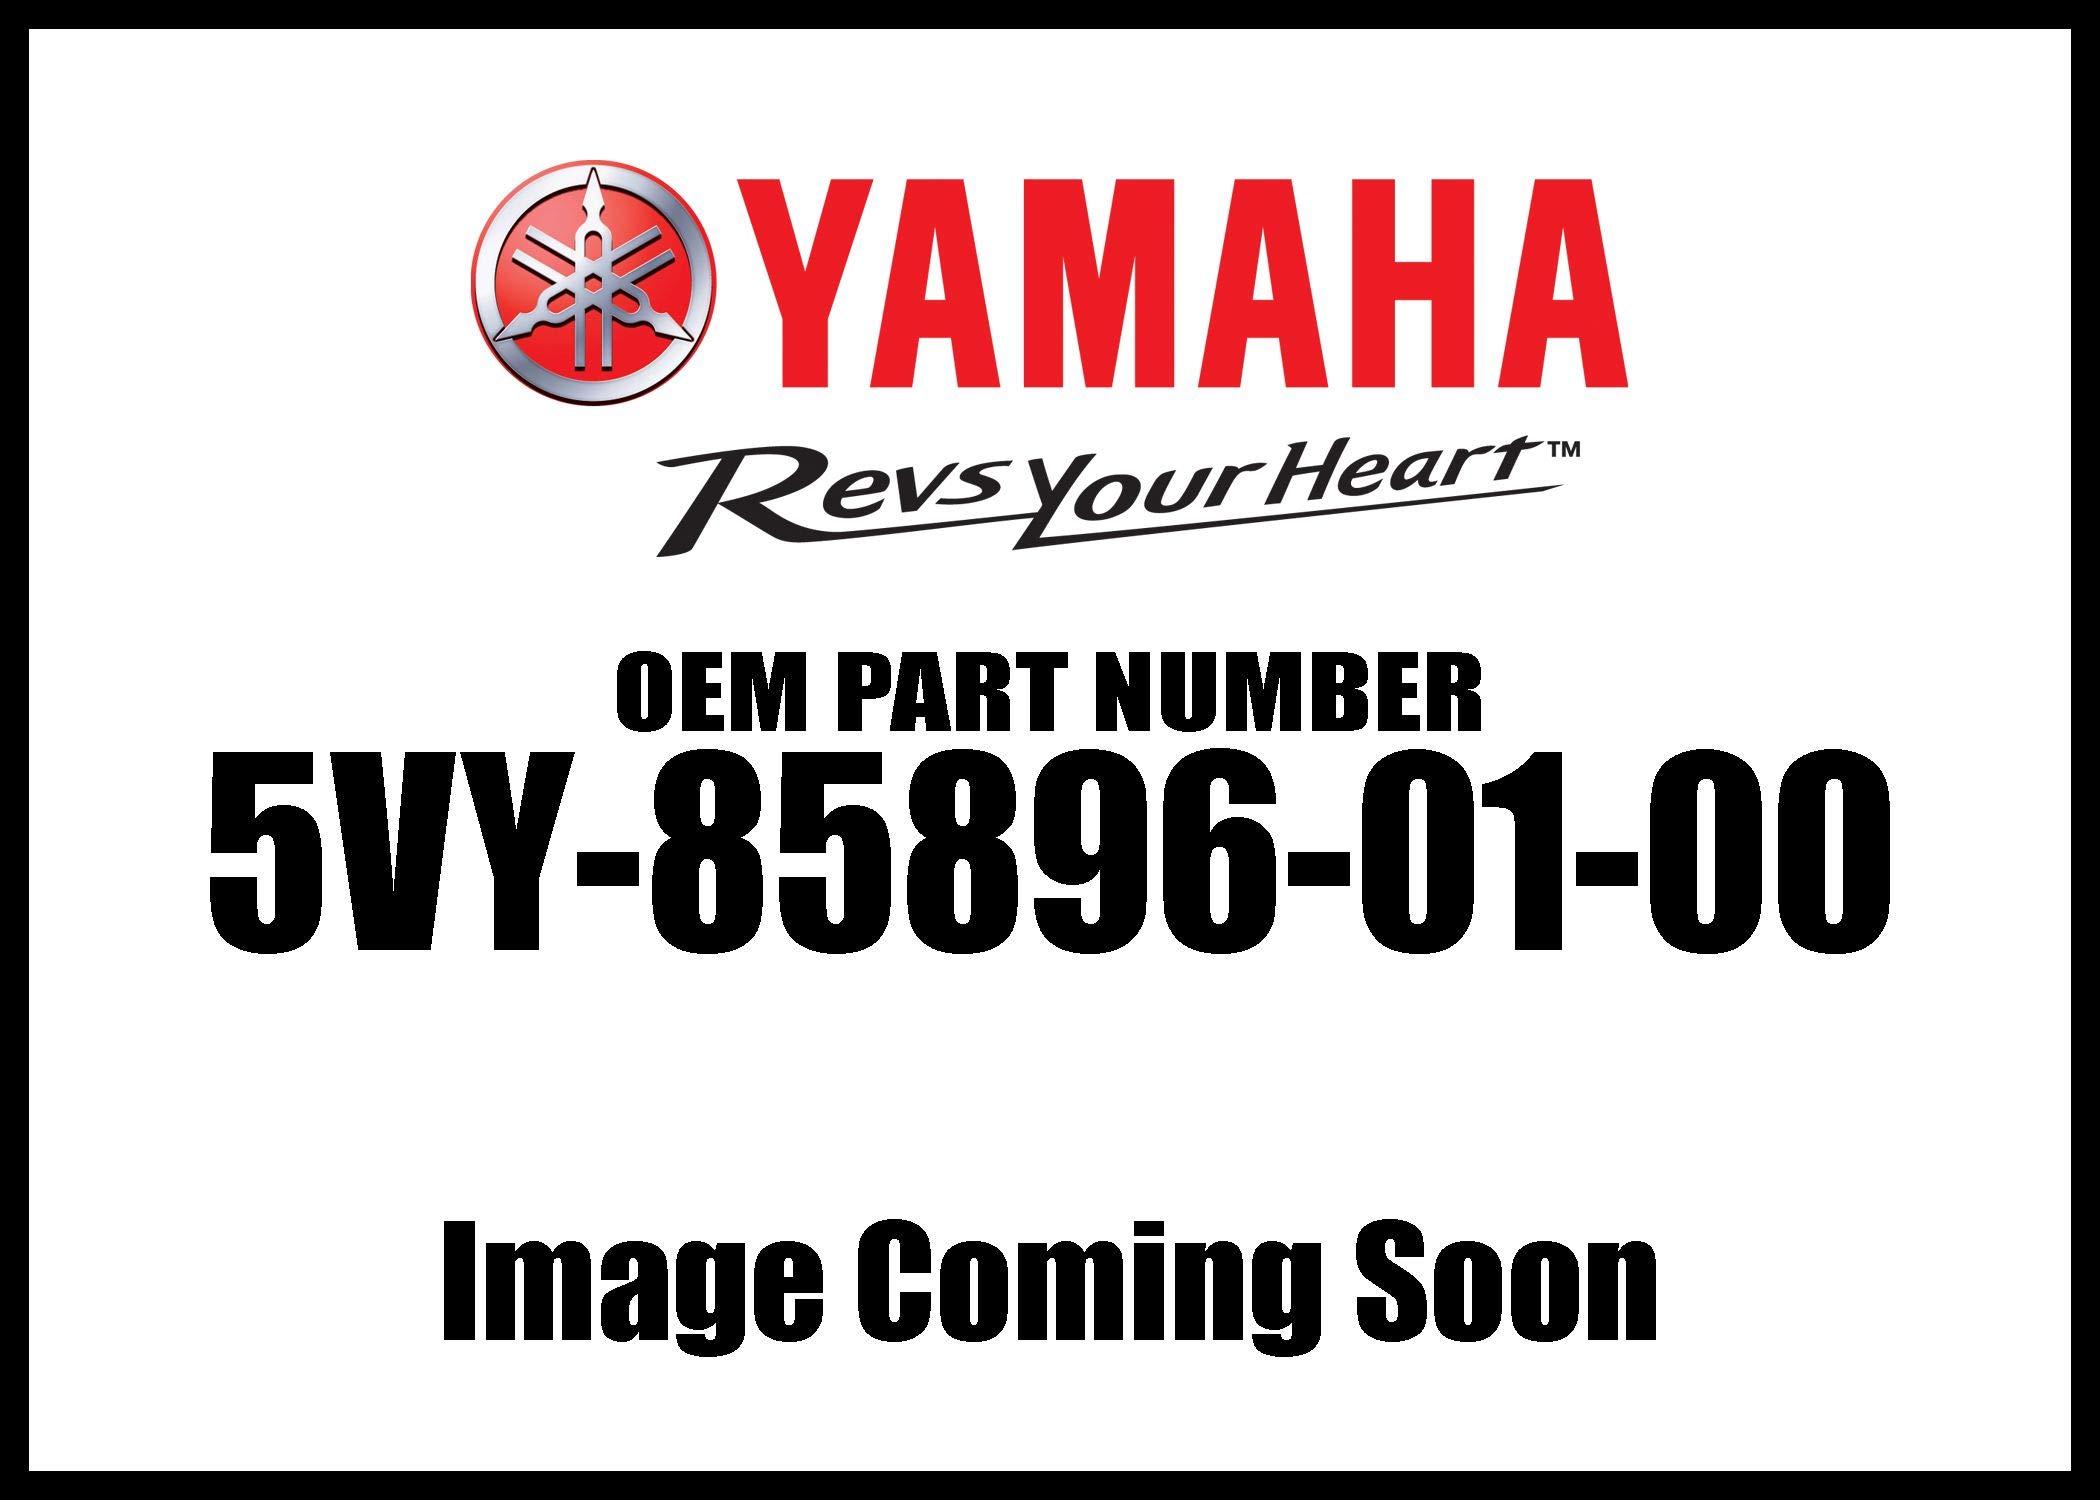 Yamaha 5VY-85896-00-00 Sensor, Cam Position; New # 5VY-85896-01-00 Made by Yamaha